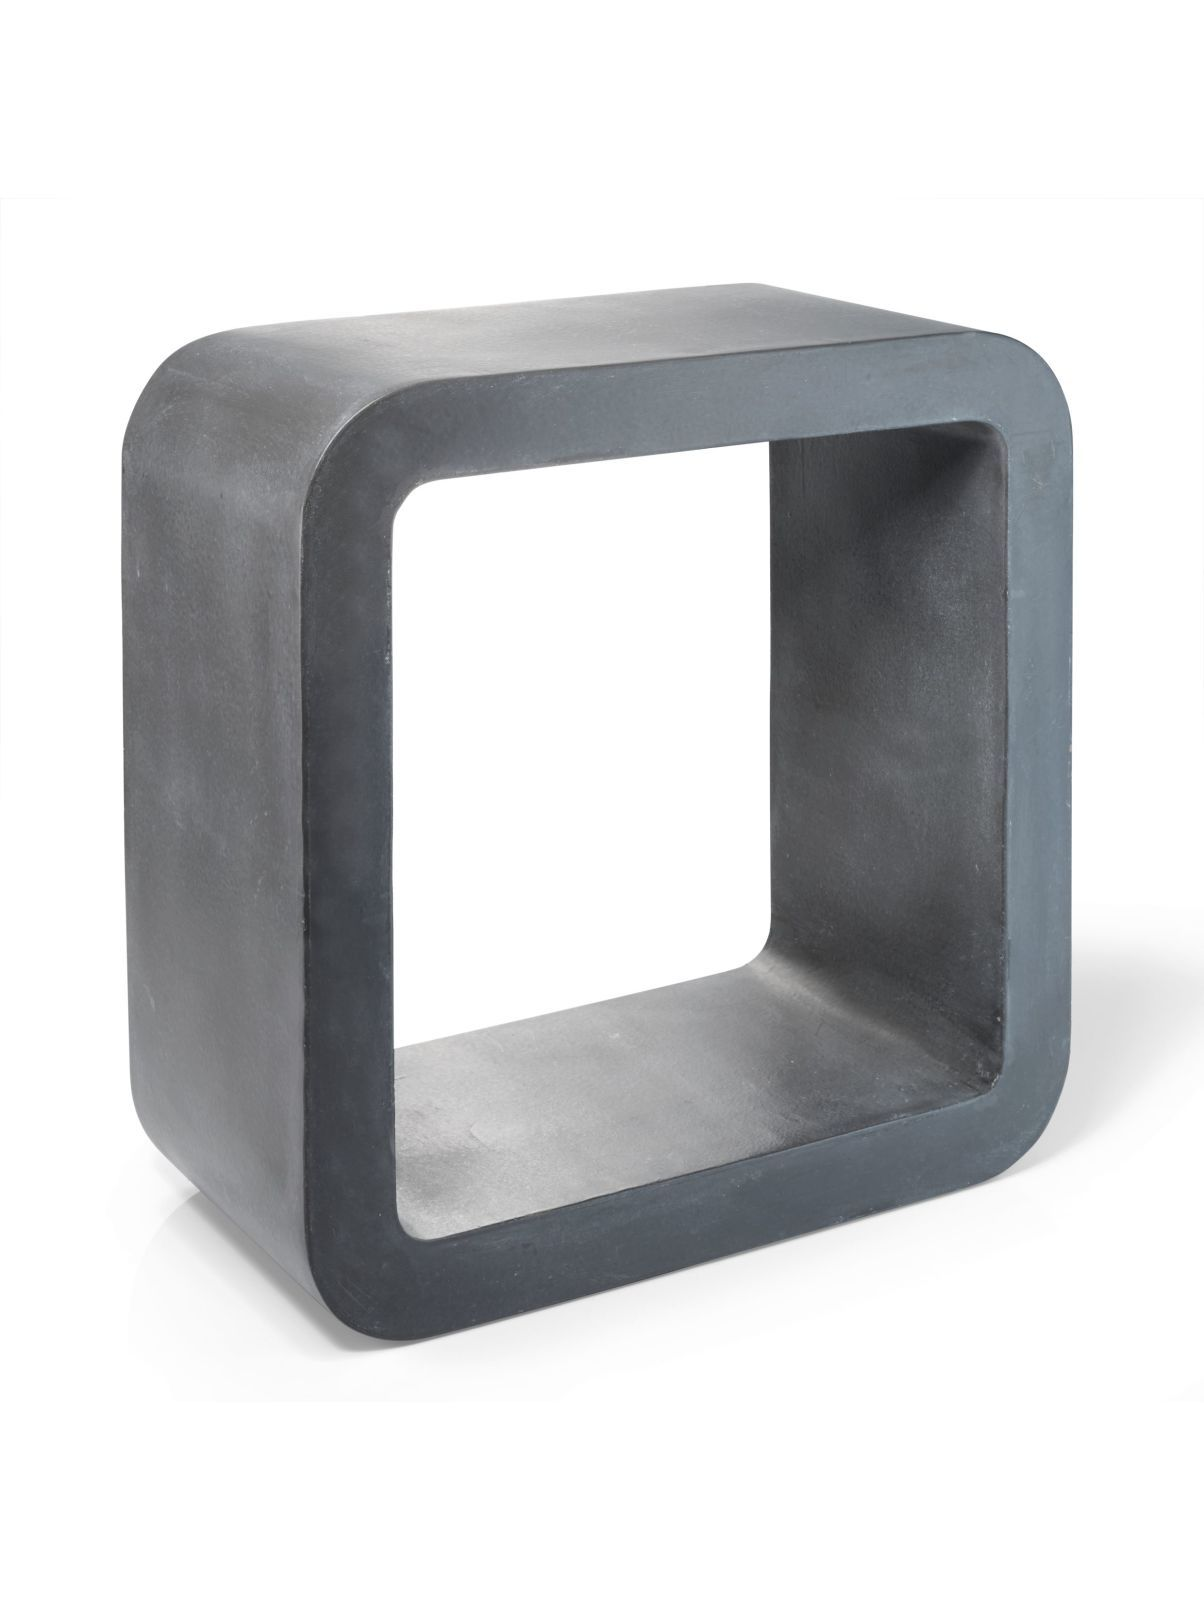 Wandregal Cube, Modern, MDF Jetzt Bestellen Unter: Https://moebel.